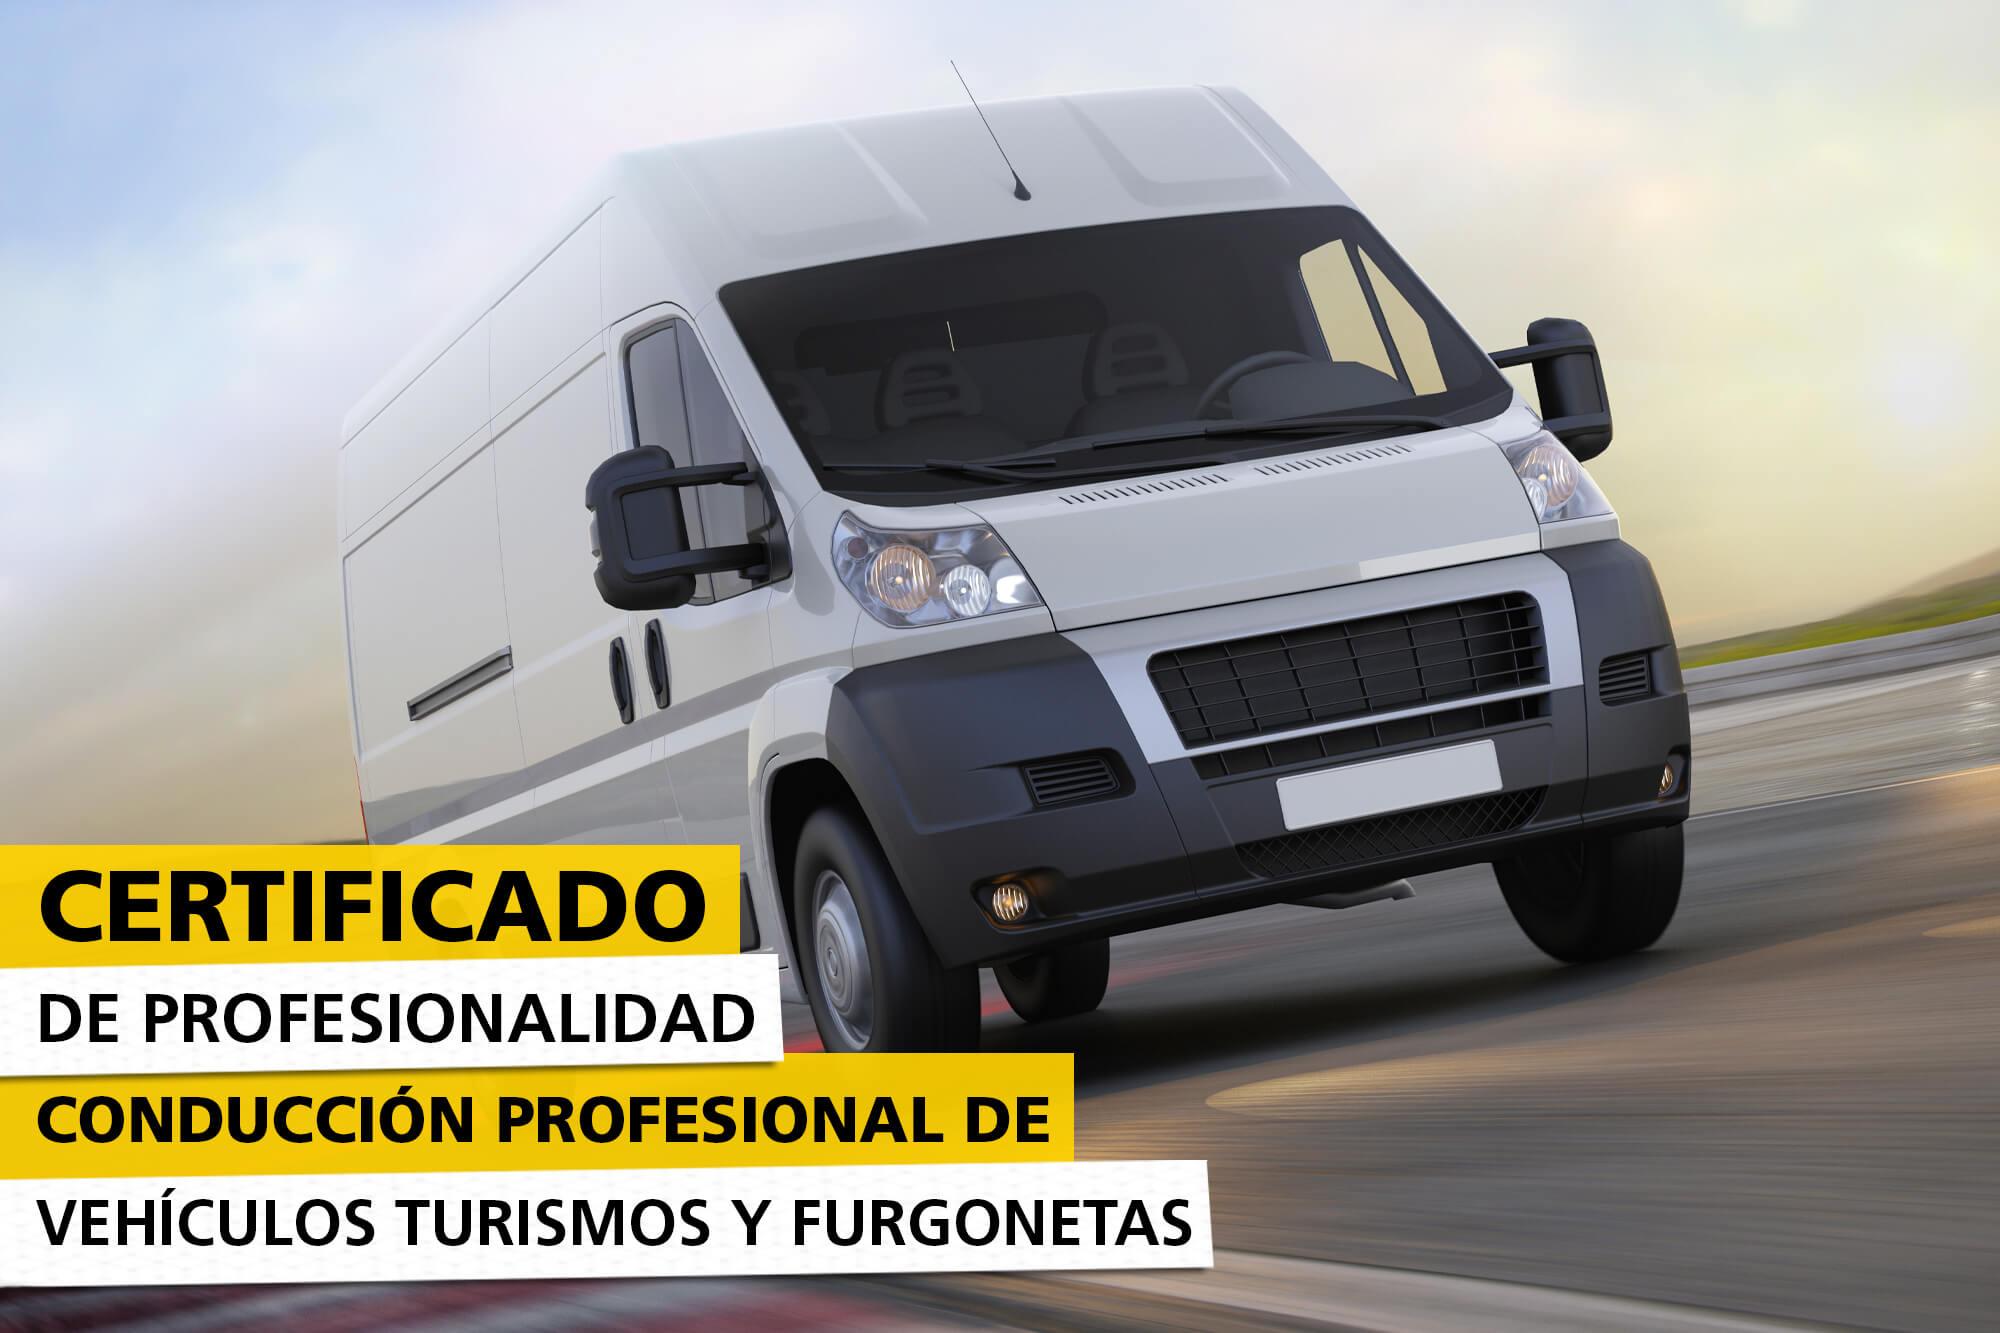 certificado-profesional-conduccion-profesional-turismos-furgonetas-img-destacada